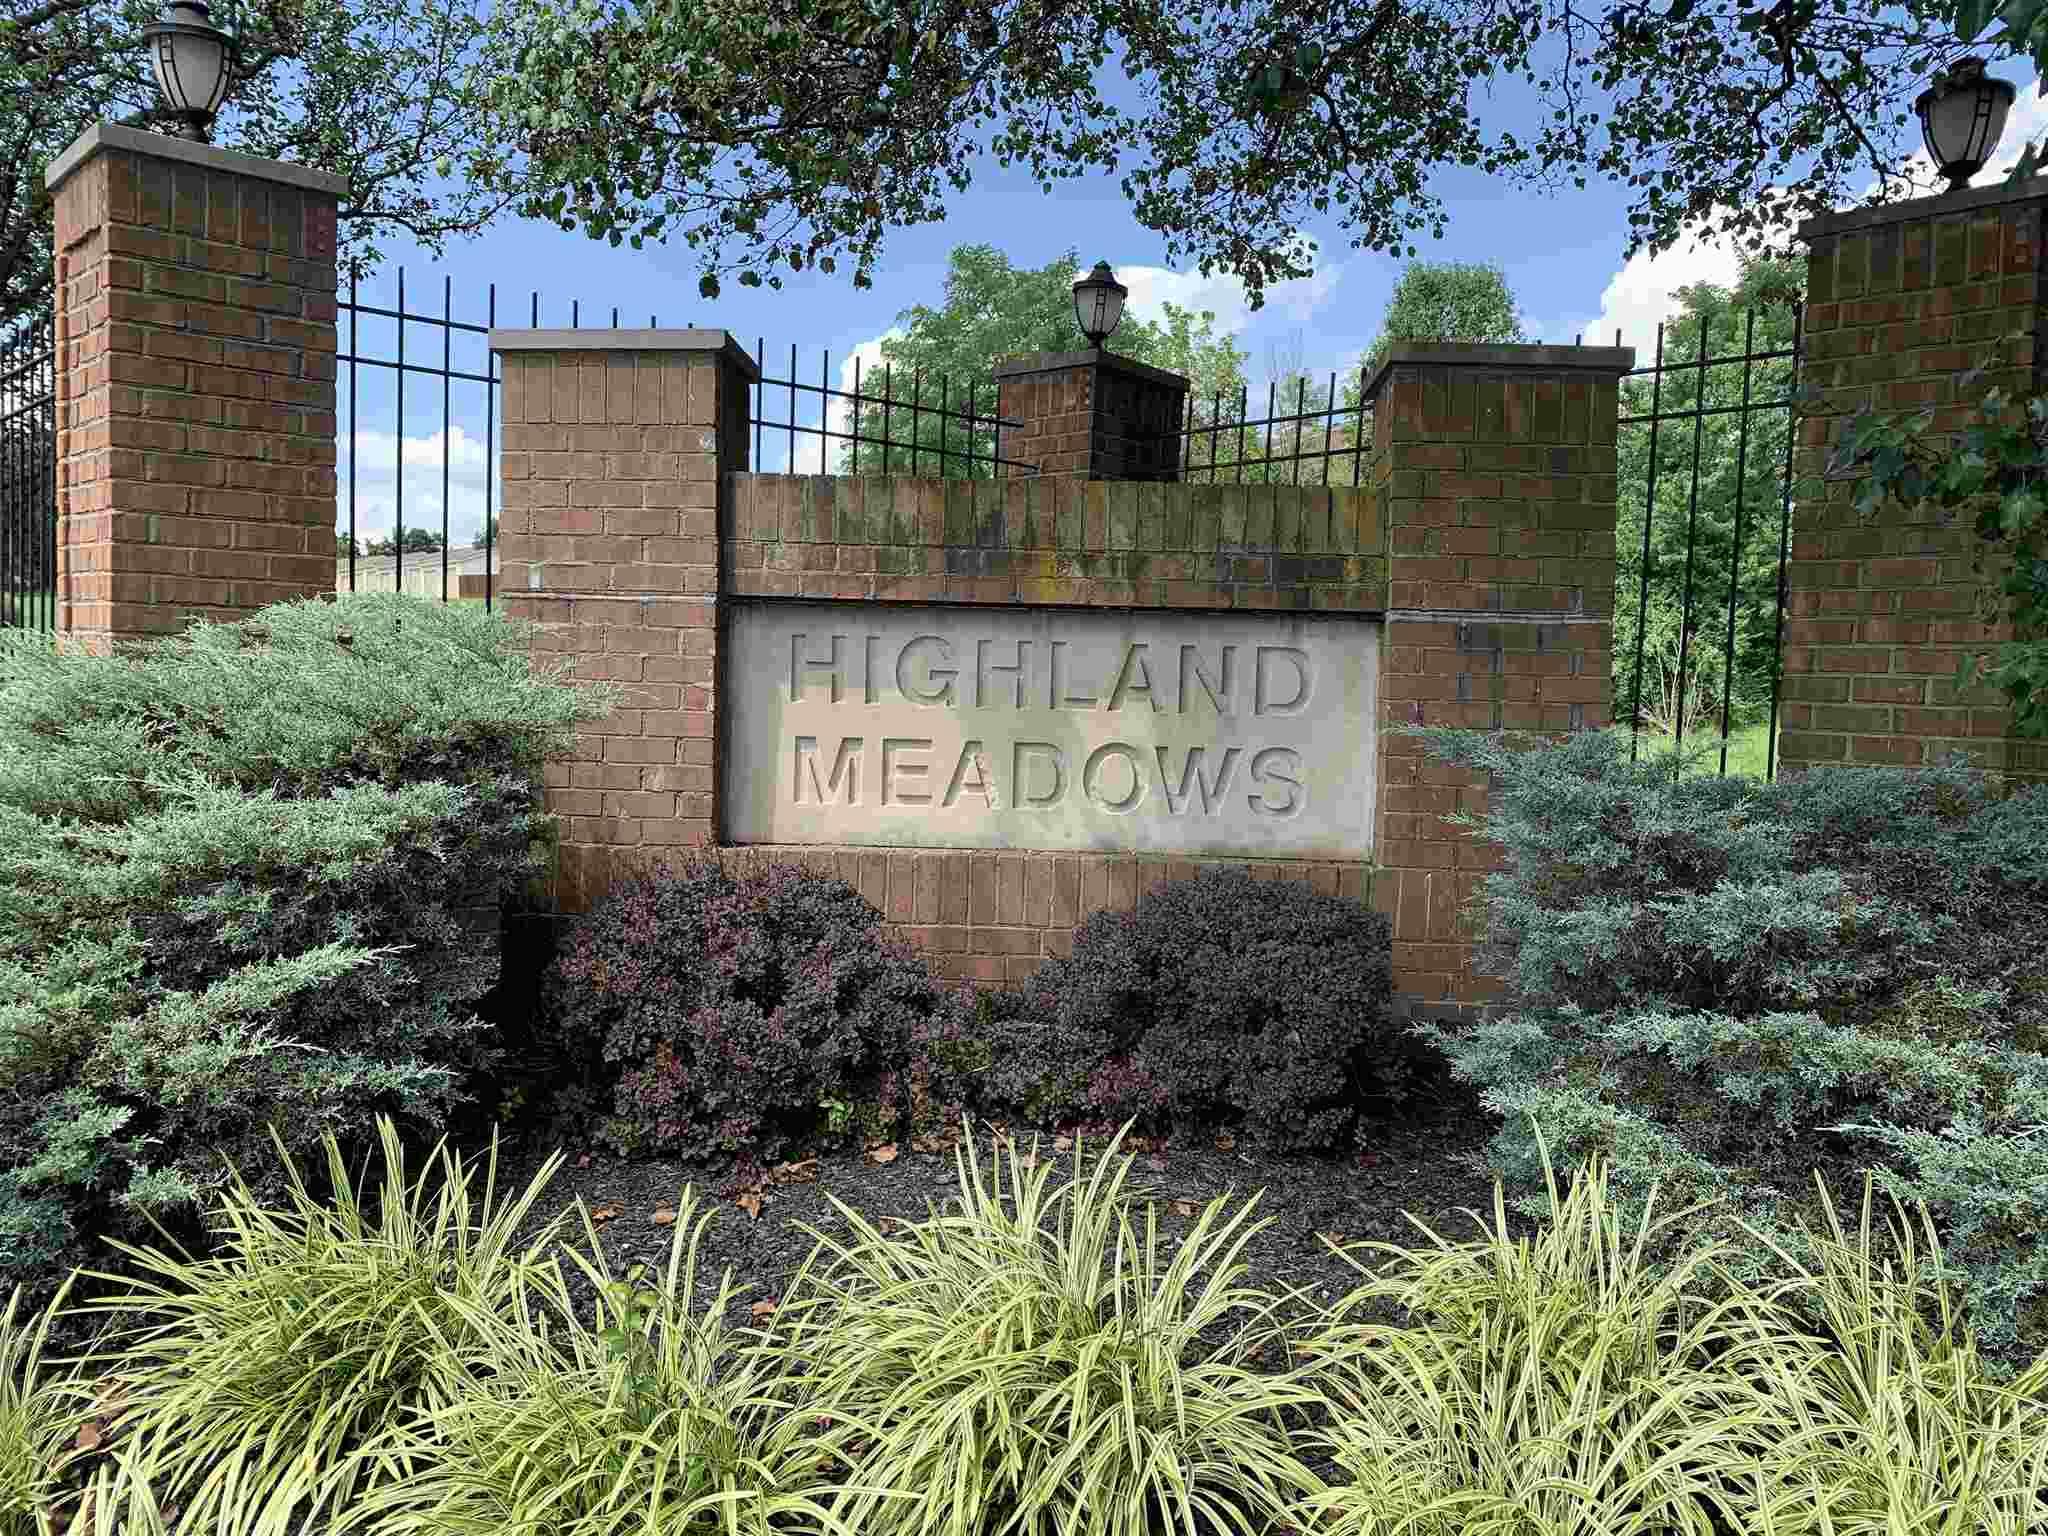 Photo 2 for 31 Highland Meadows #1 Highland Heights, KY 41076